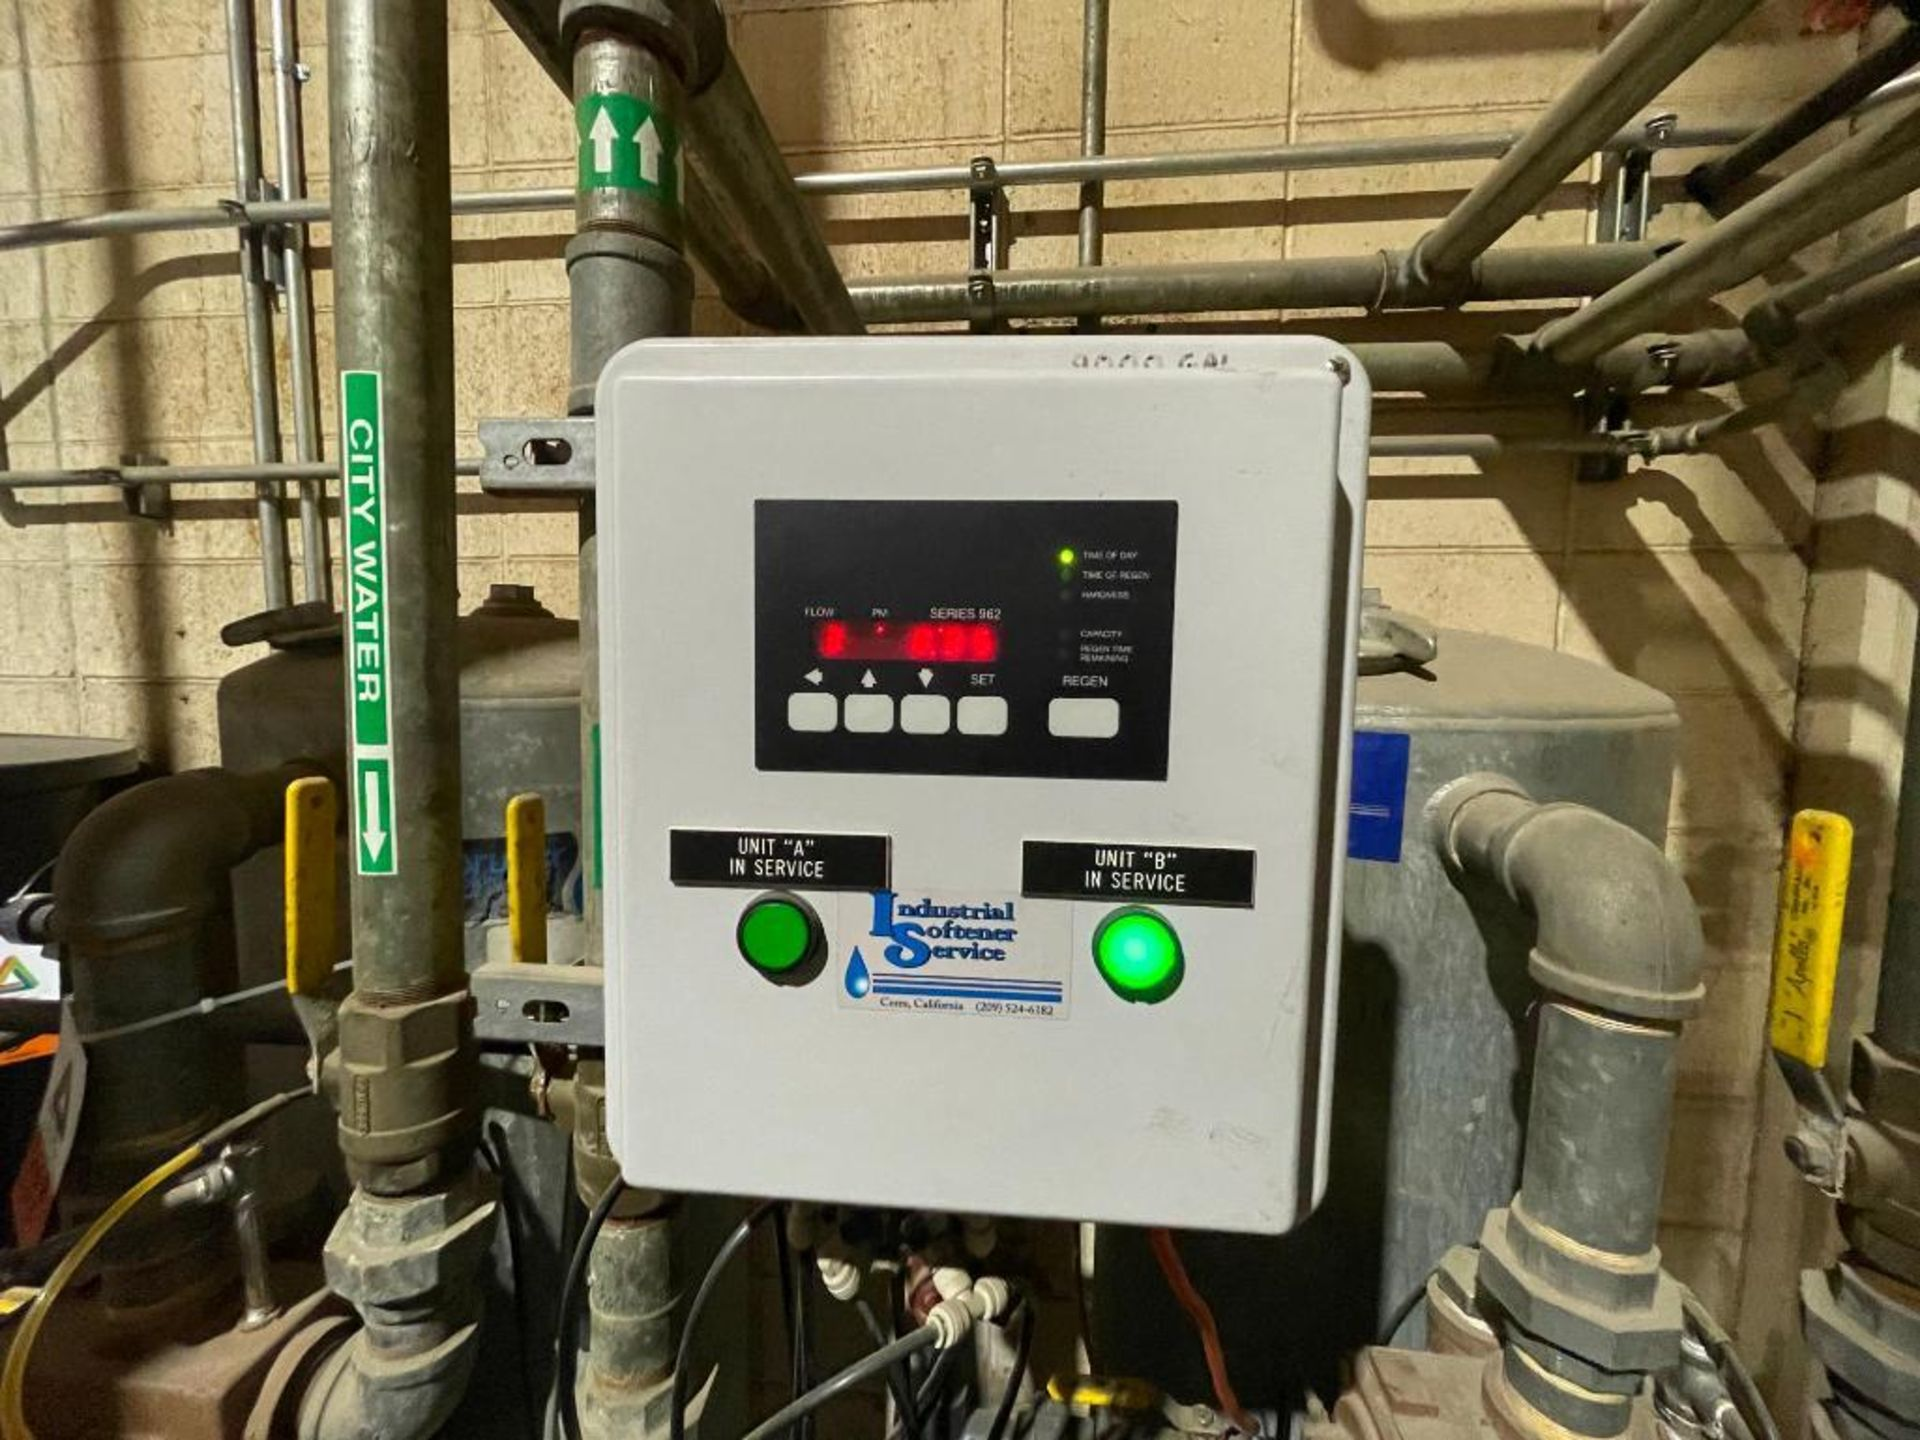 3-tank industrial water softener - Image 5 of 11